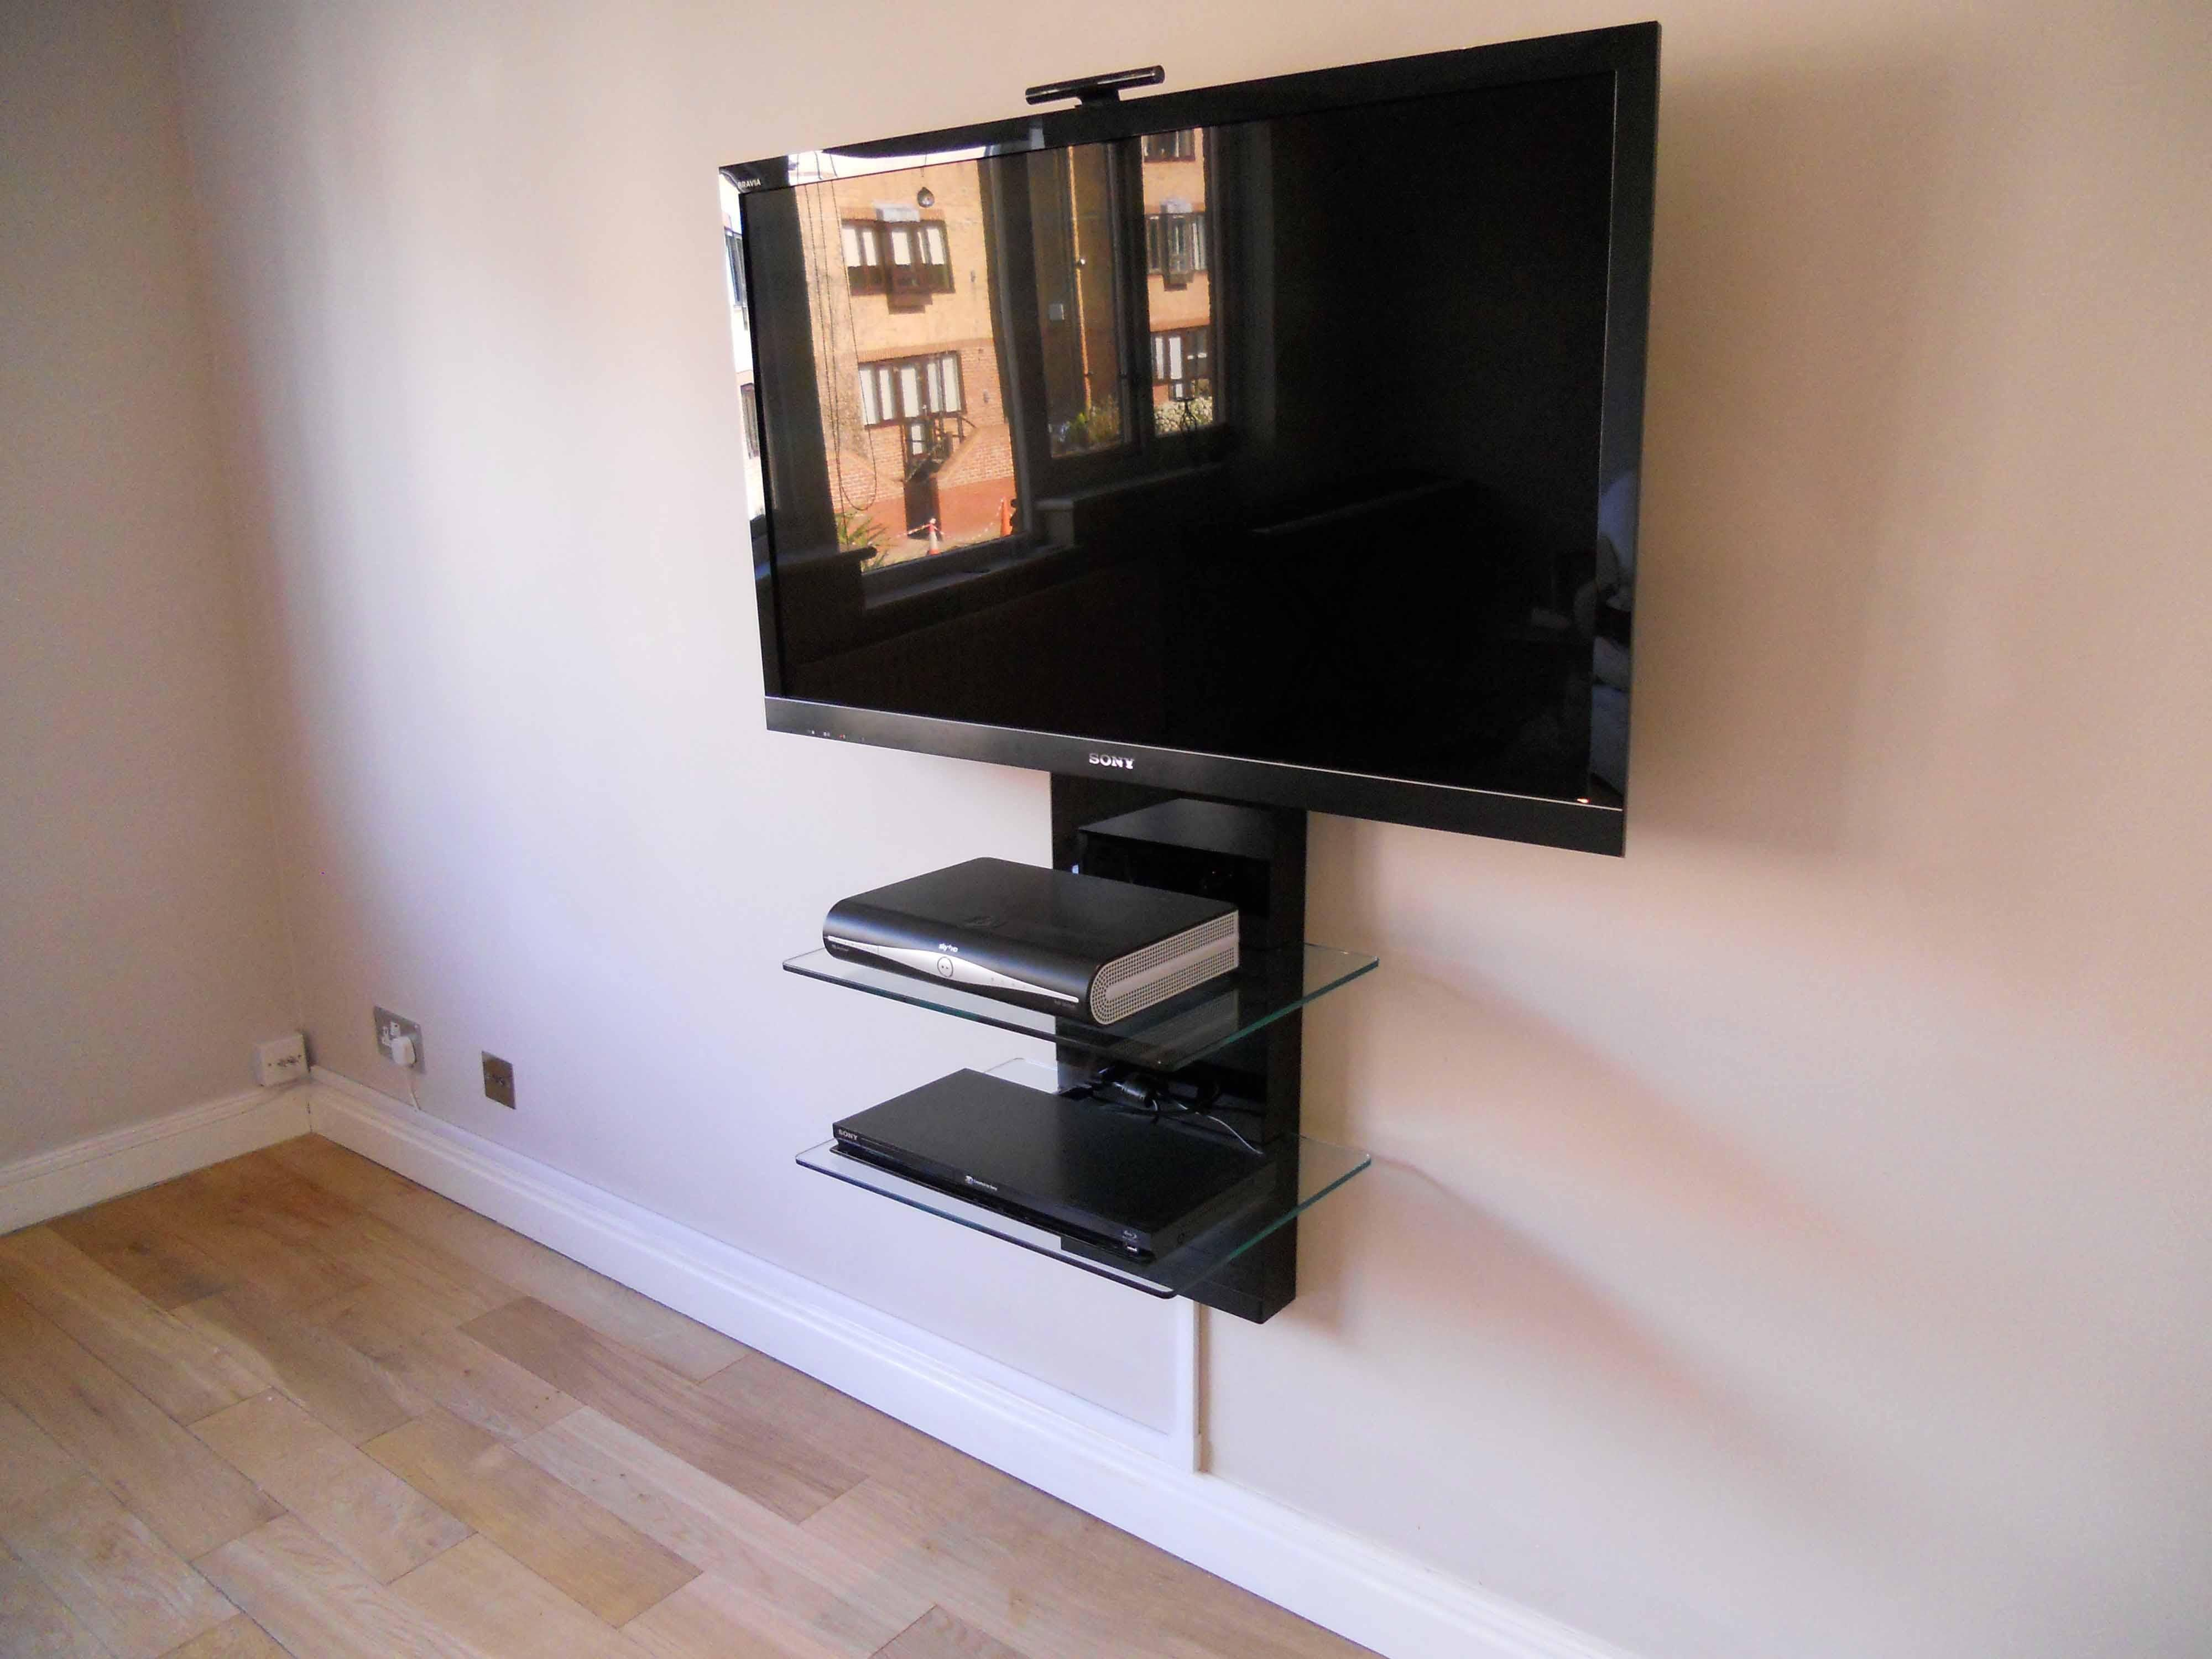 Corner Tv Wall Mount Bracket With Shelf Wall Mounted Shelves Tv Wall Shelves Wall Mounted Tv